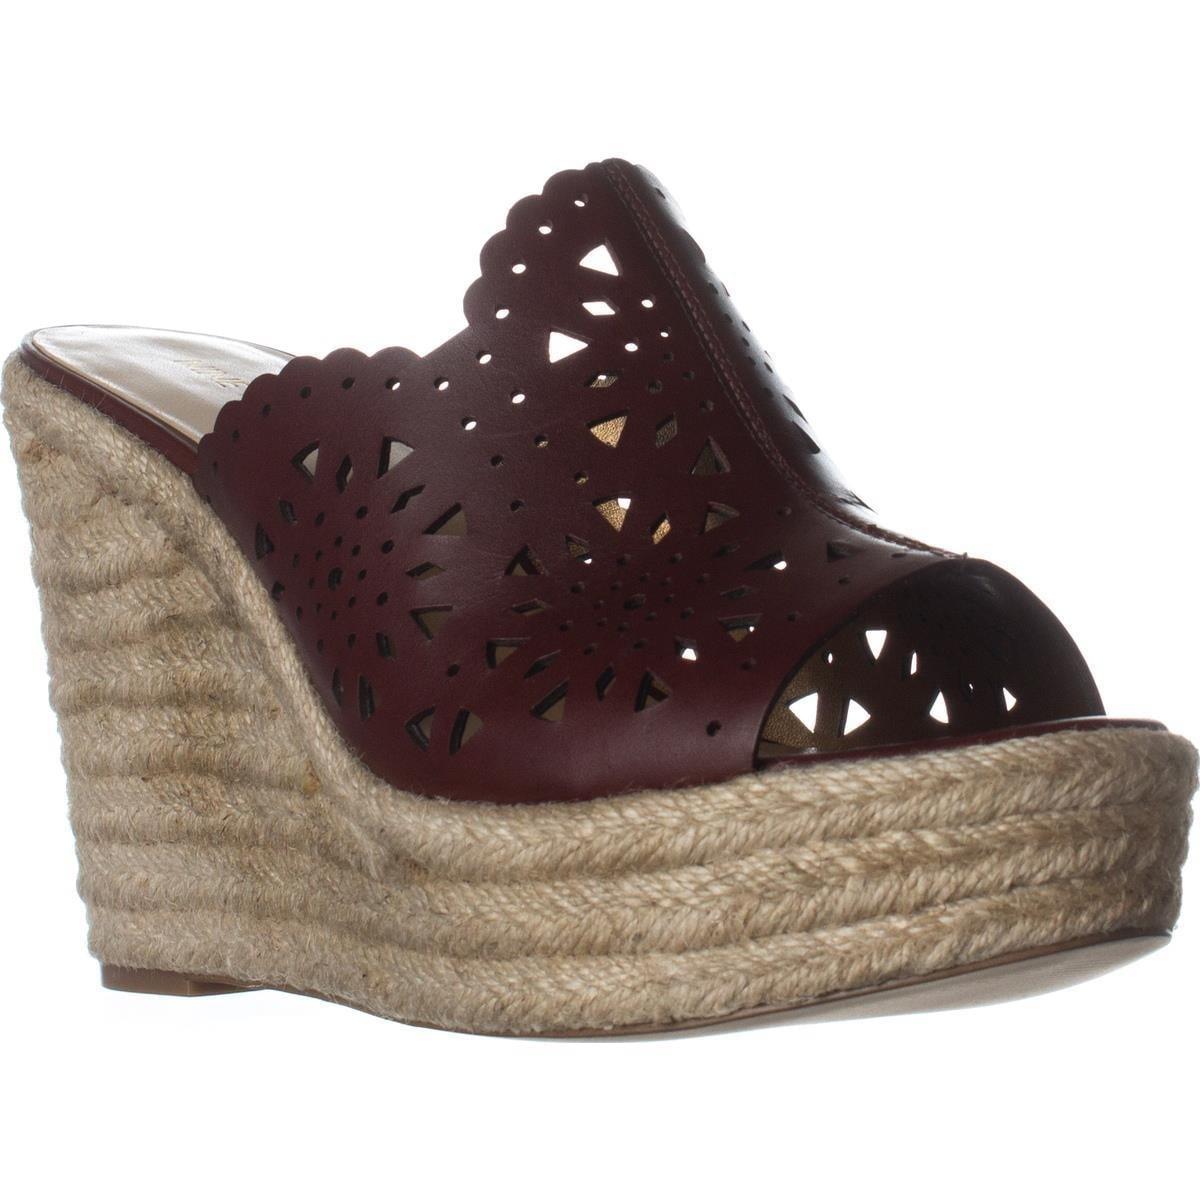 adfe180495b Shop Nine West Derek Wedge Scalloped Sandals